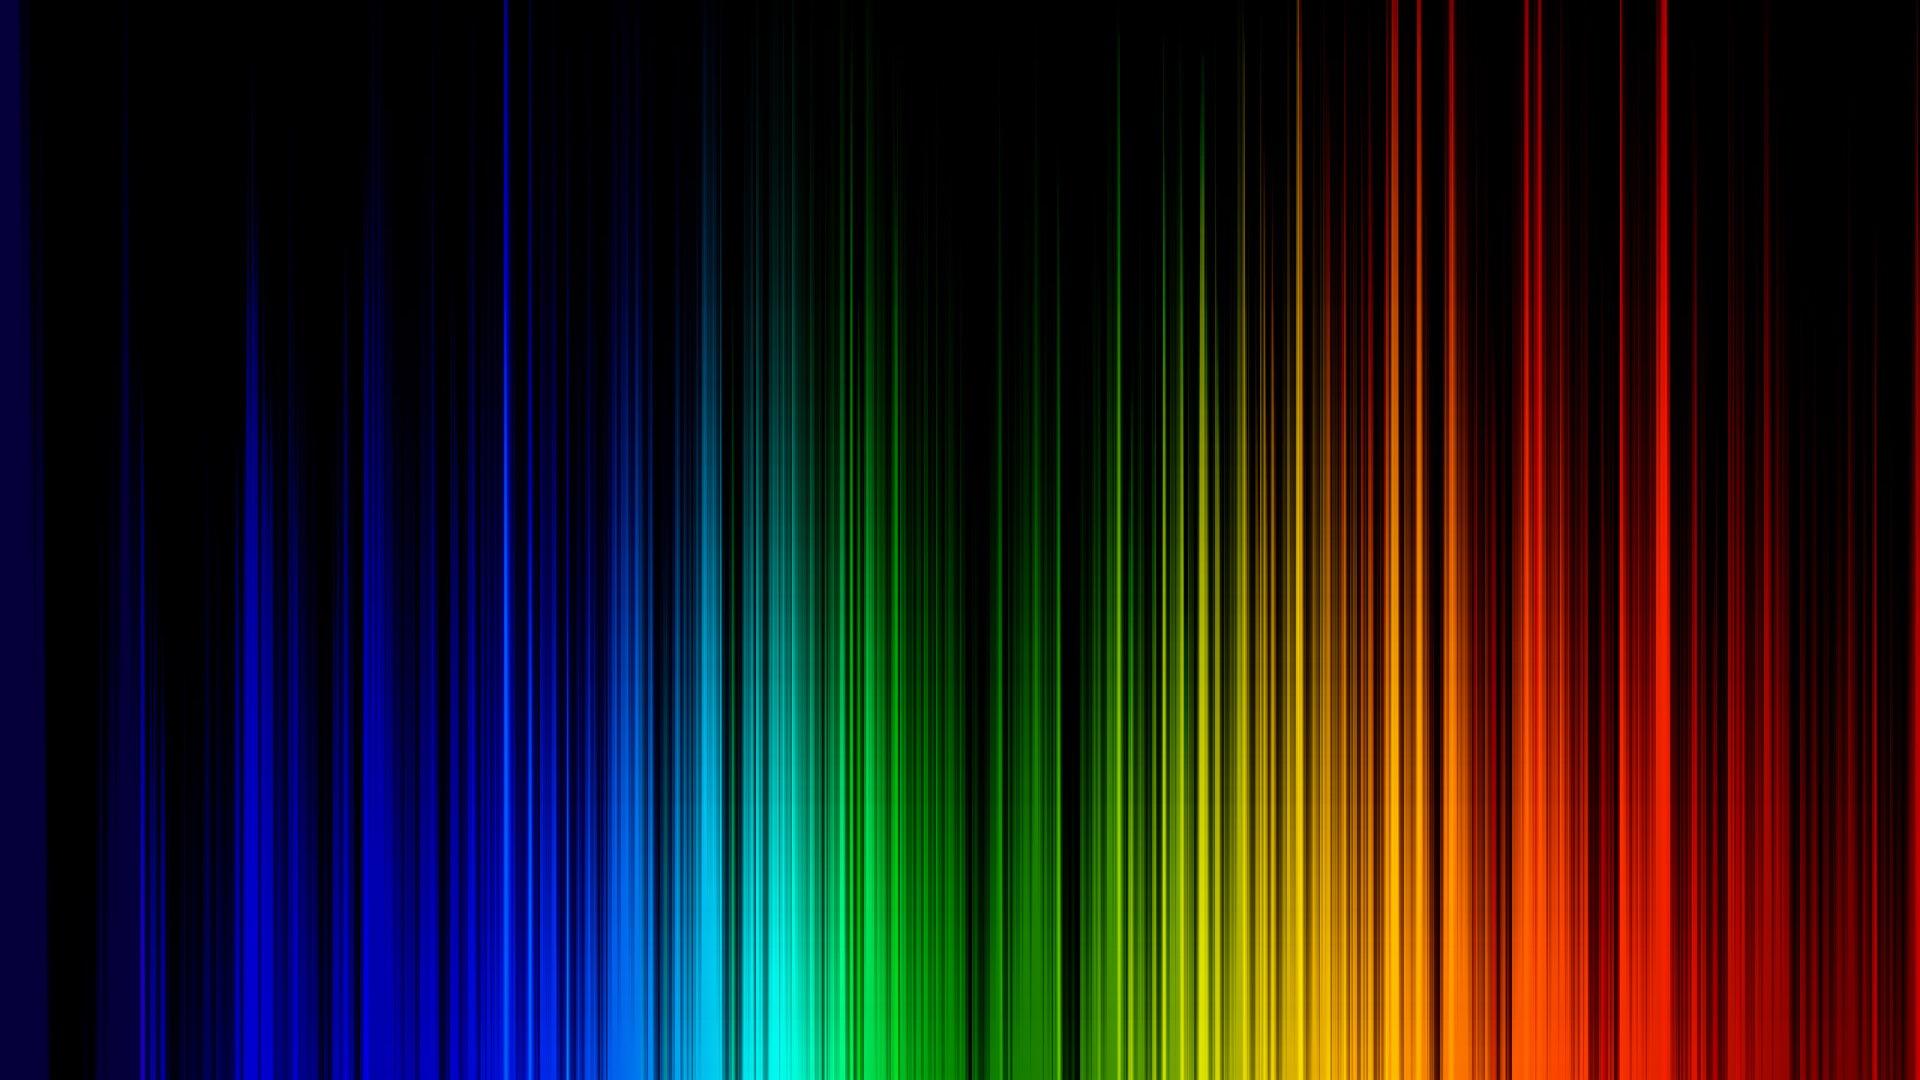 helle farbe hintergrundbild 1 20 1920x1080 wallpaper herunterladen helle farbe. Black Bedroom Furniture Sets. Home Design Ideas